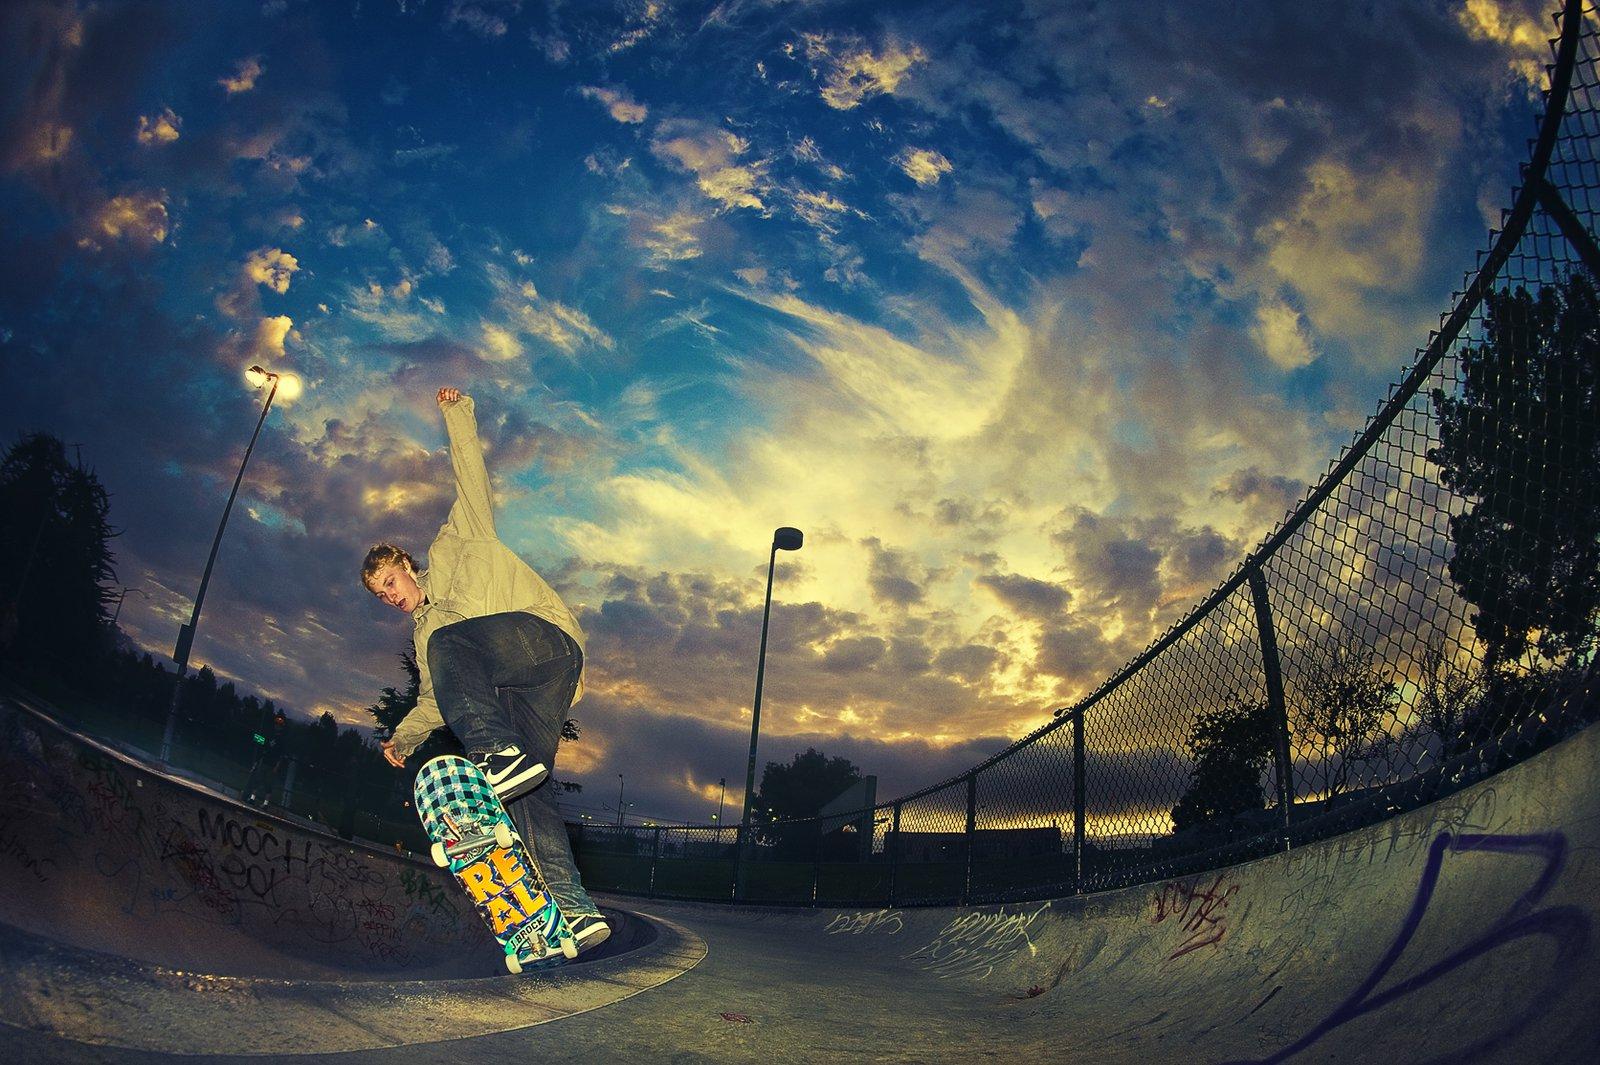 Skate dawn shot